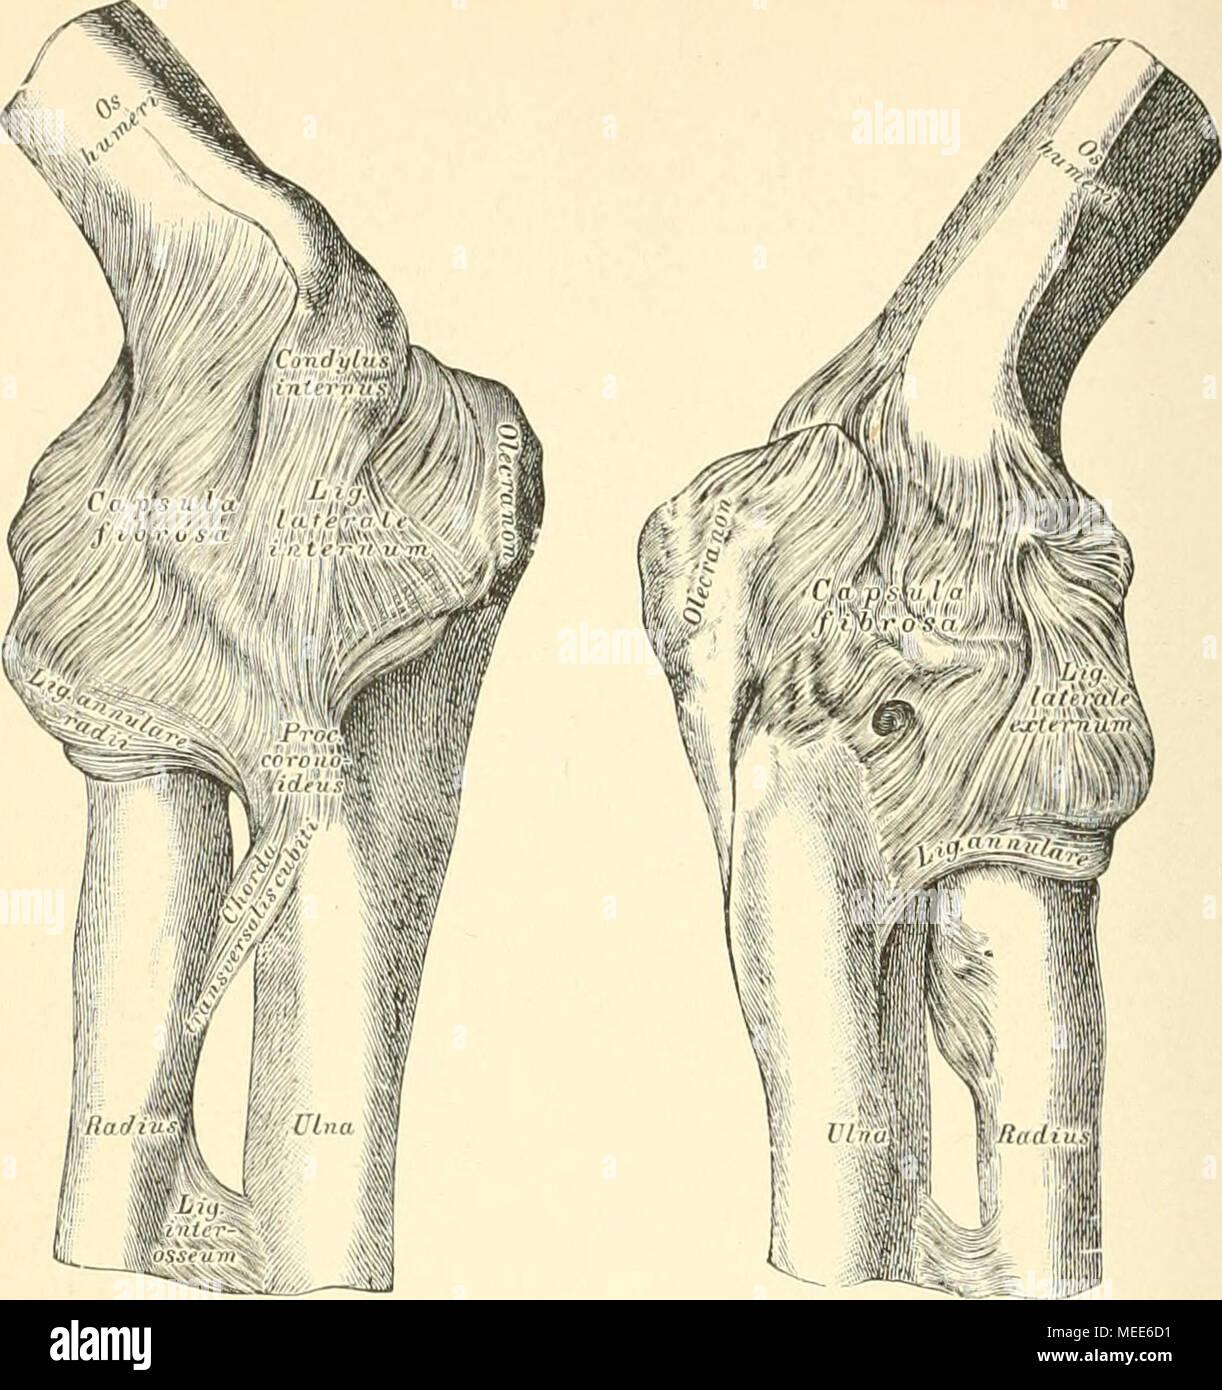 Großzügig Bugmann Kapsel Galerie - Anatomie Und Physiologie Knochen ...